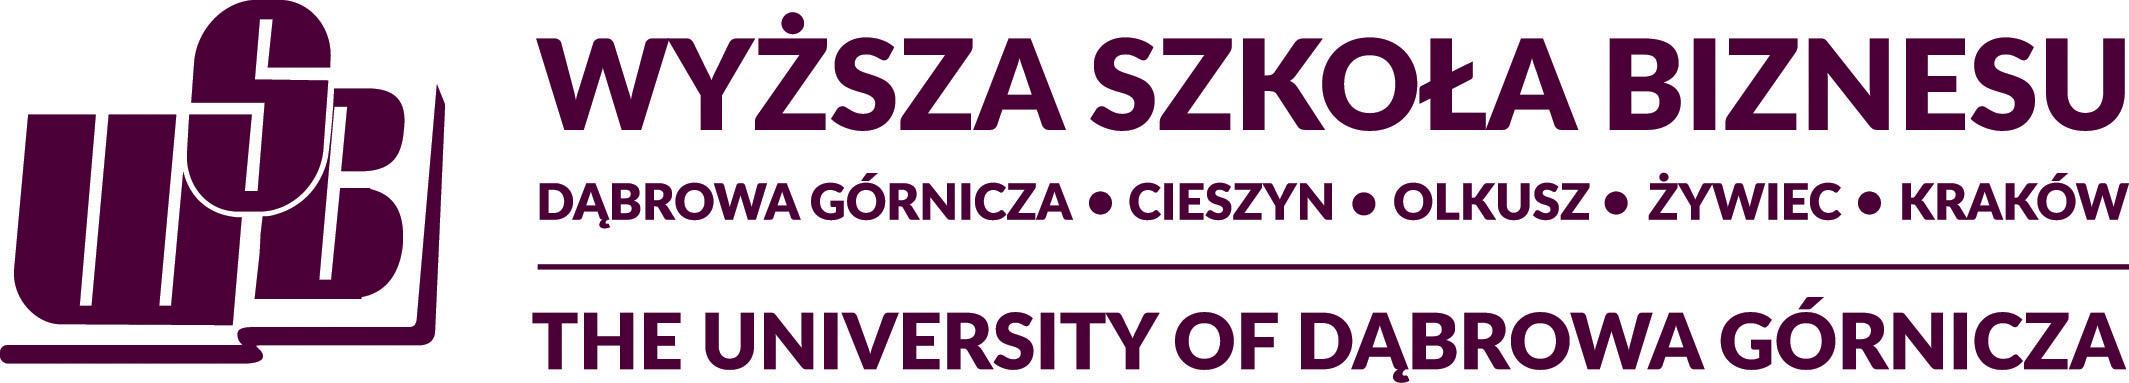 UNIVERSITY OF DABROWA GORNICZA, FACULTY OF APPLIED SCIENCES, POLAND